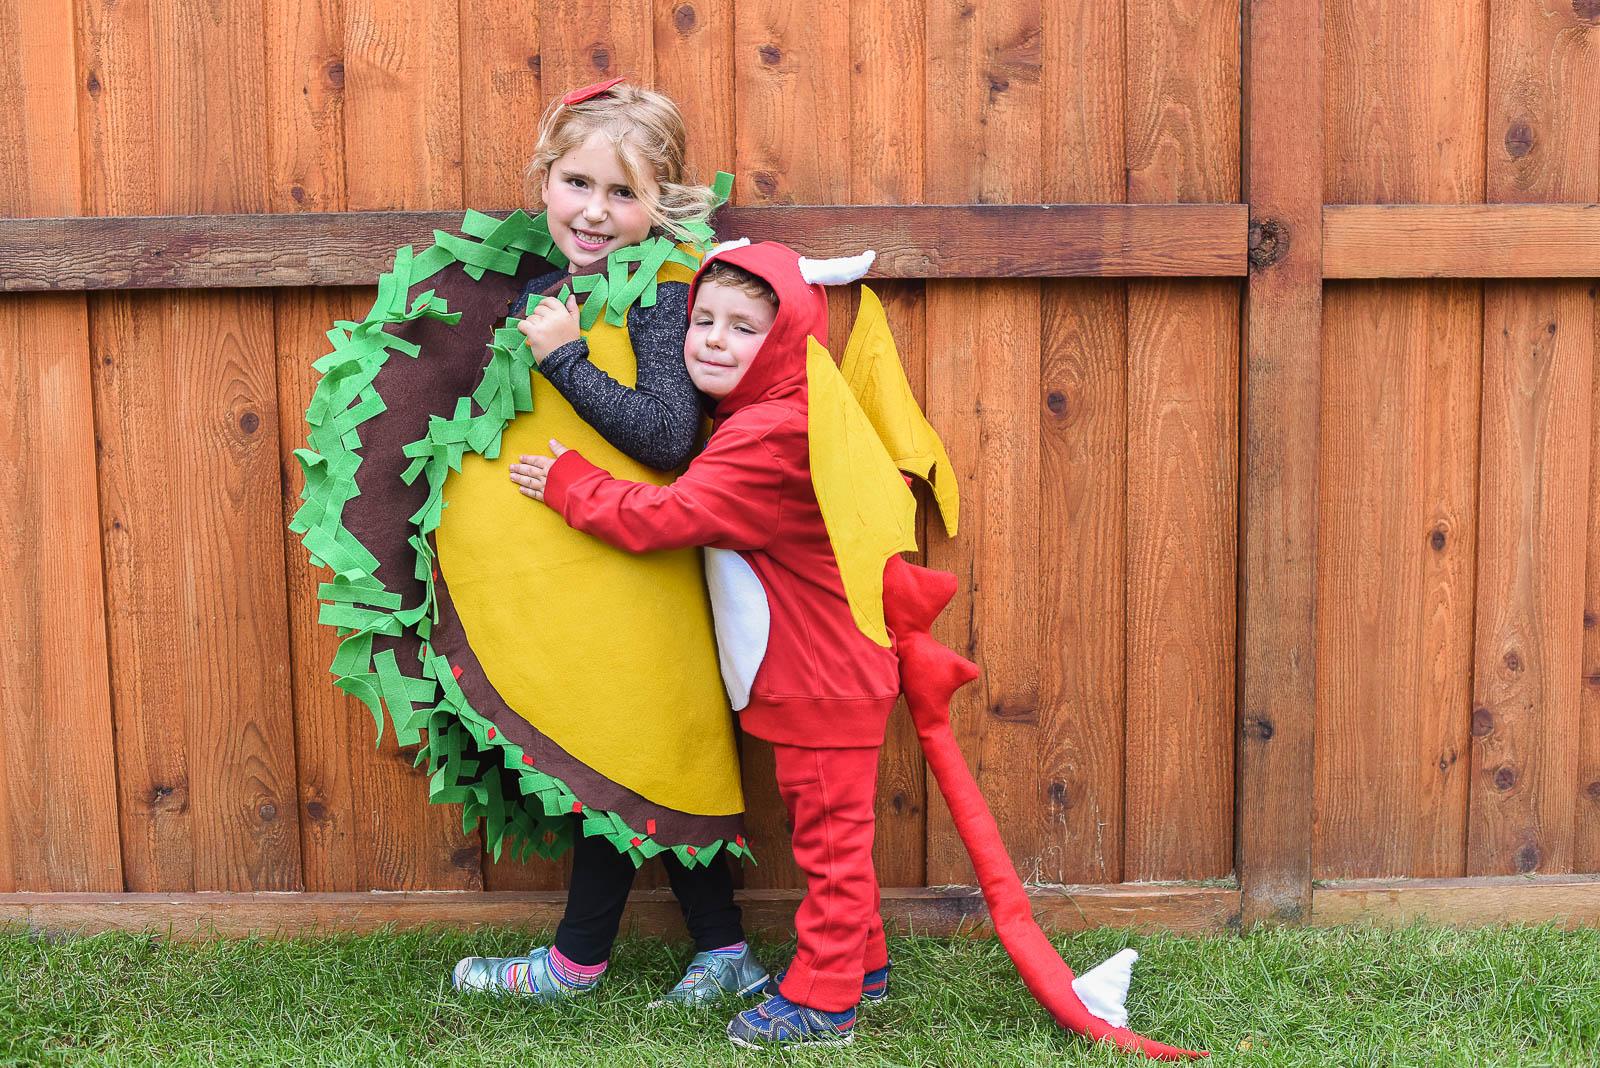 Dragons Love Tacos Costumes DIY  sc 1 st  Homemakeru0027s Habitat & Easy DIY Dragons Love Tacos Costumes for Kids u2022 Homemakeru0027s Habitat